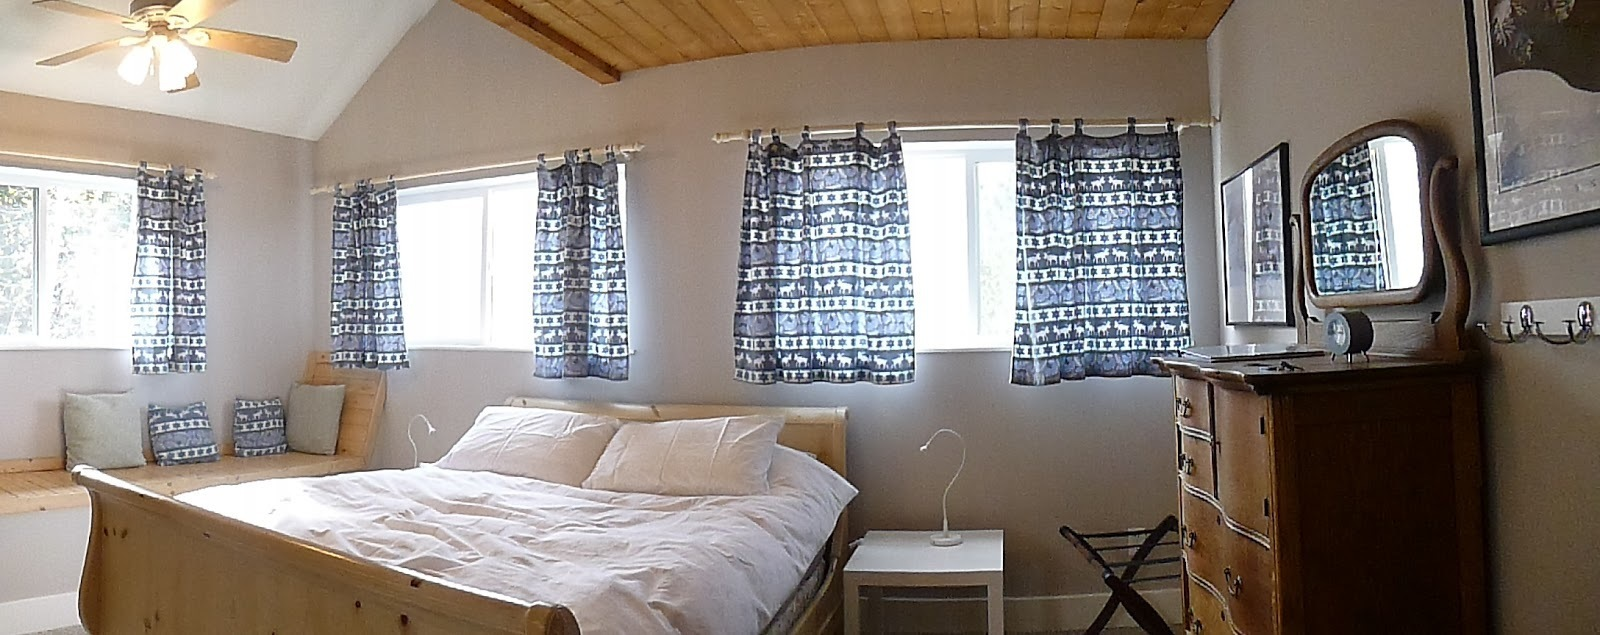 Atomic Chalet Bed & Breakfast